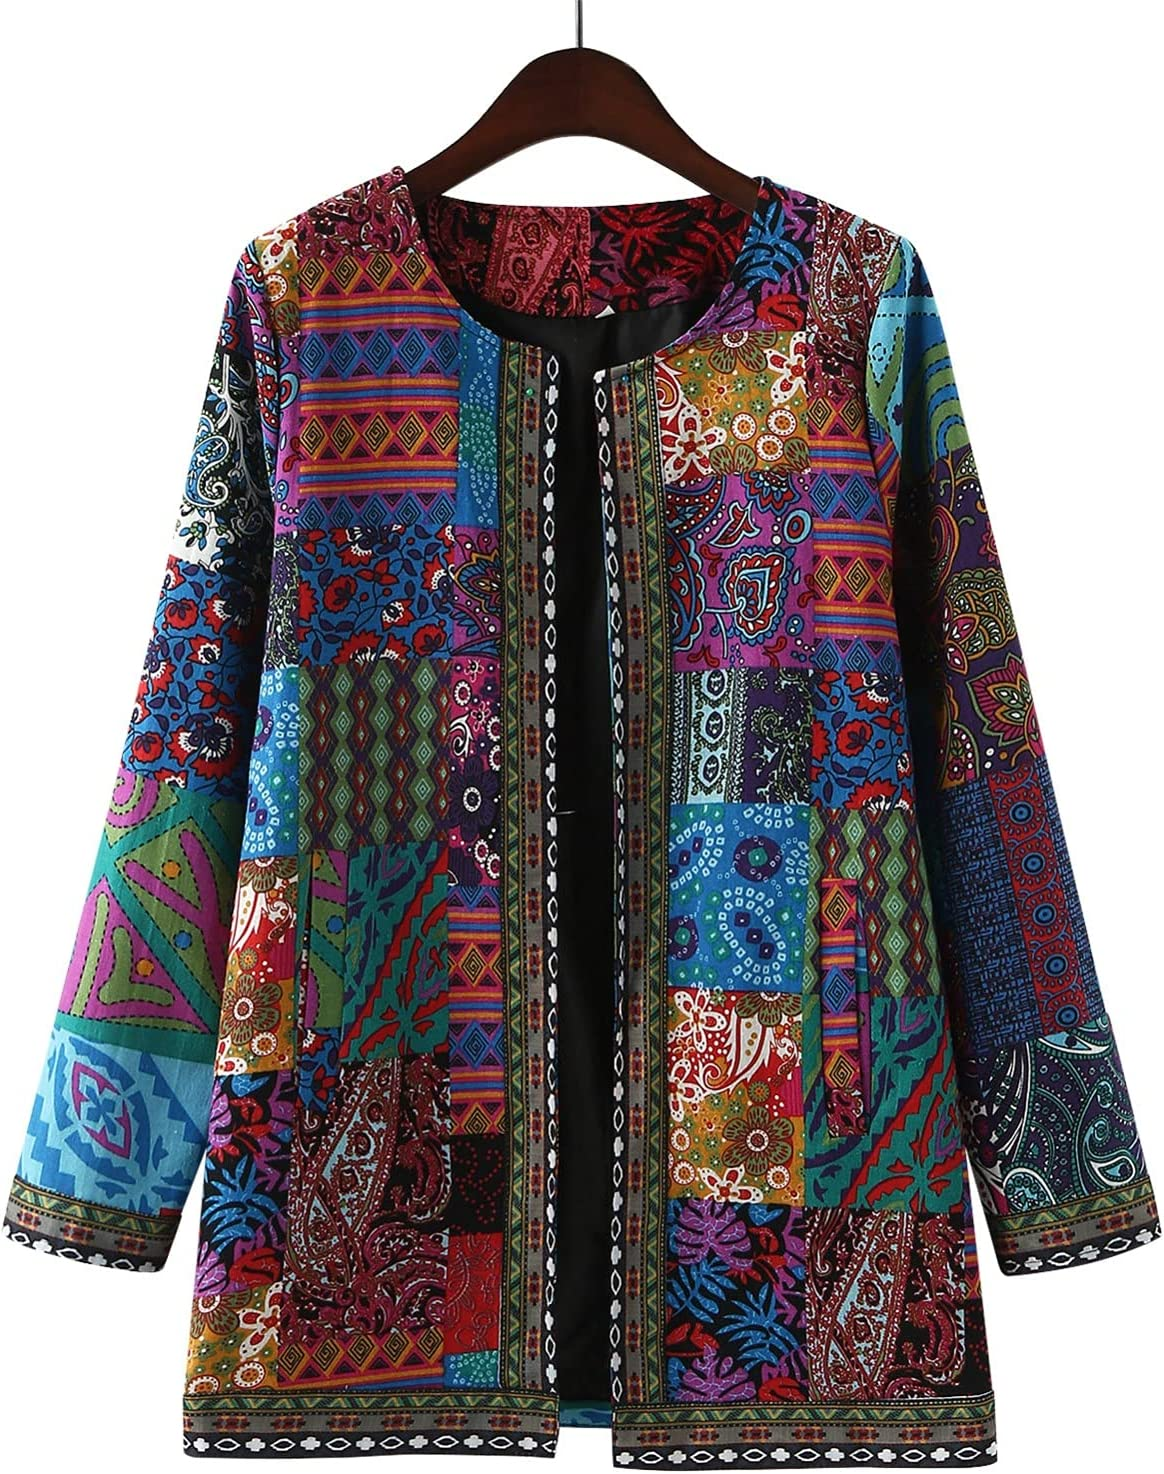 Tenworld Women's Fashion Jacket Leisure Retro Cotton Linen African Print Loose Long Sleeve Coat Cardigan